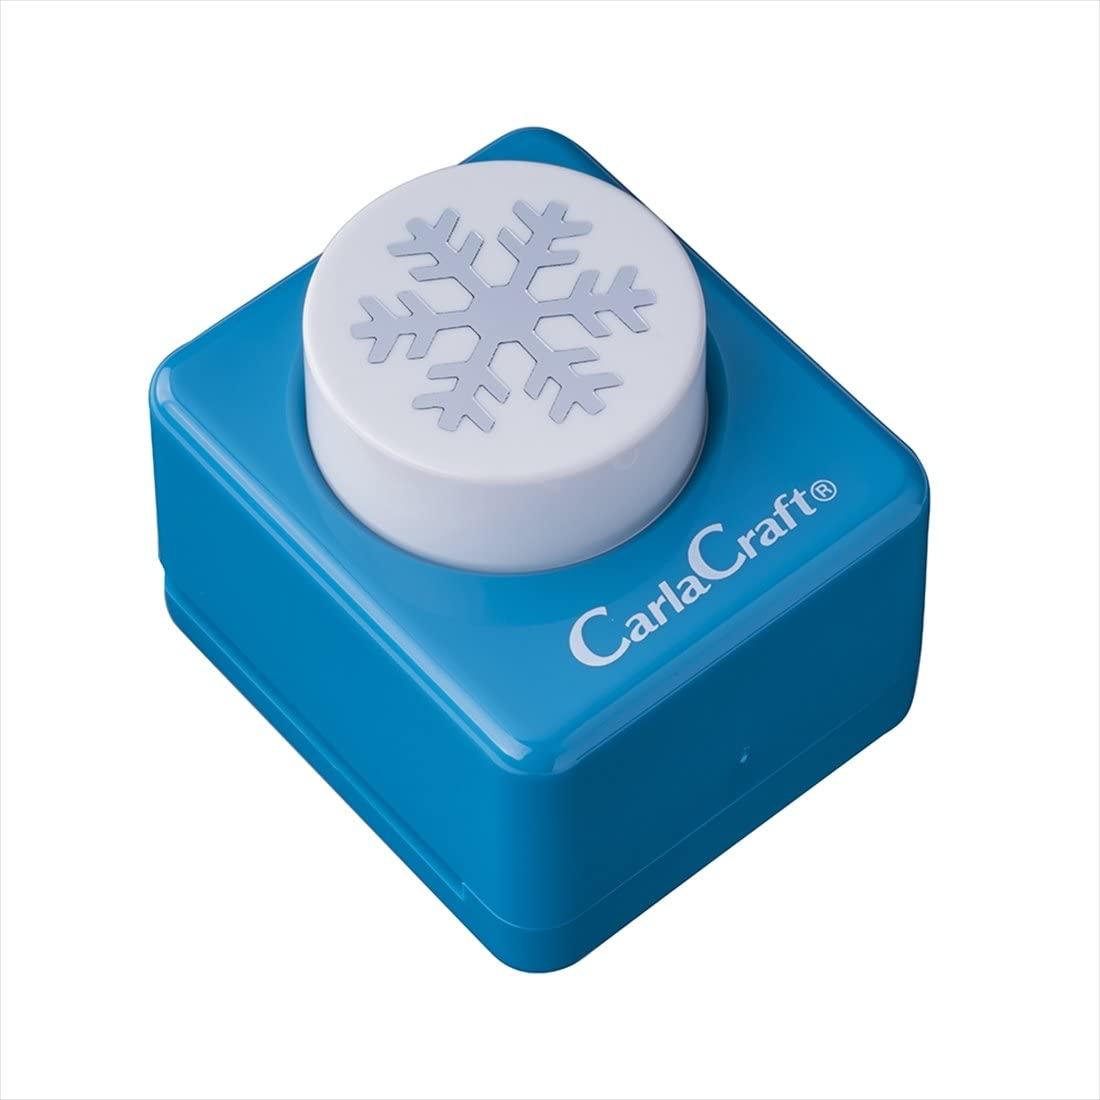 Carl Craft Craft Paper Punch, Snow (CP-2 Snow B)